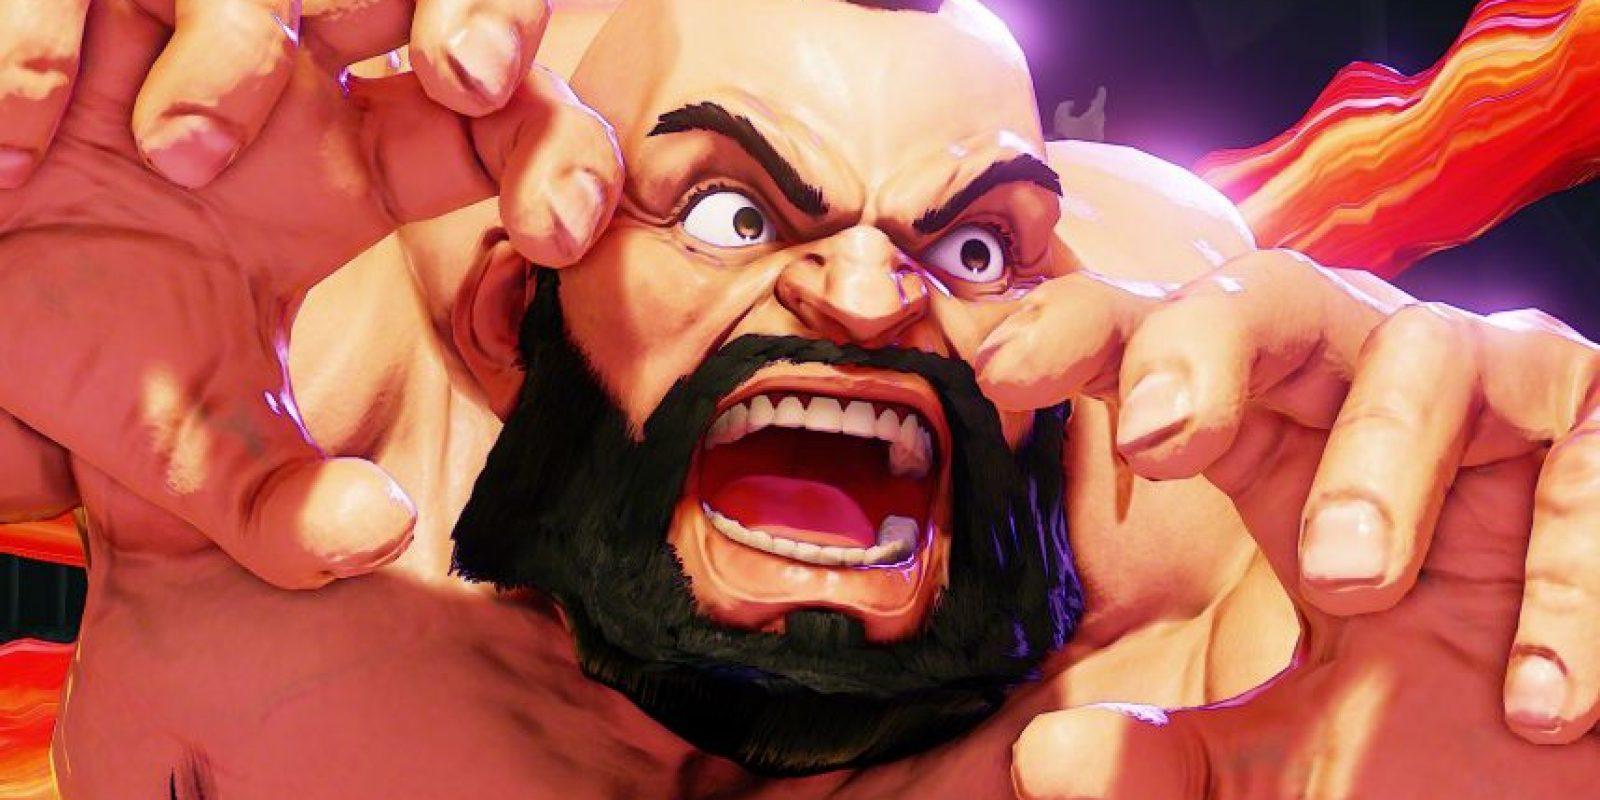 El gran Zangief regresa para una nueva aventura en Street Fighter V. Foto:streetfighter.com